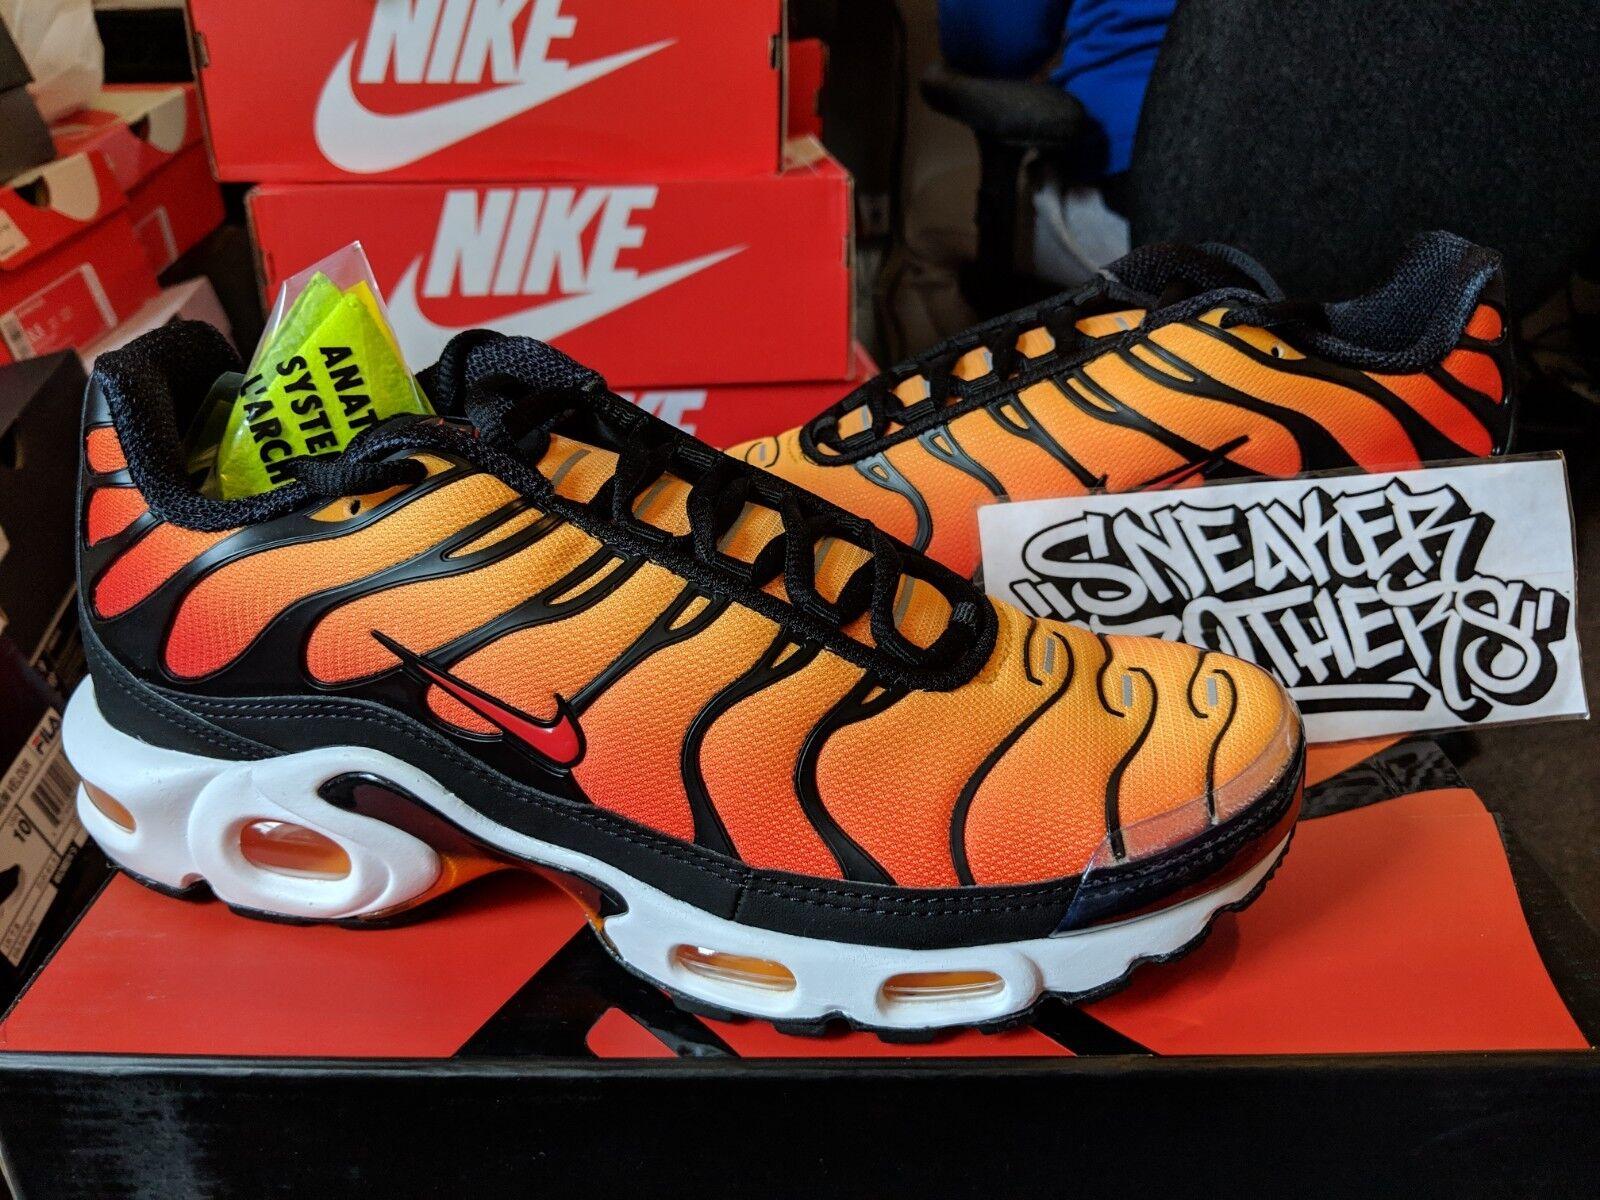 2a710e91 Спортивная обувь для мужчины Nike Air Max Plus TN OG Sunset Black Pimento  Ceramic Resin Orange BQ4629-00 - 323568167794 - купить на eBay.com (США) с  ...